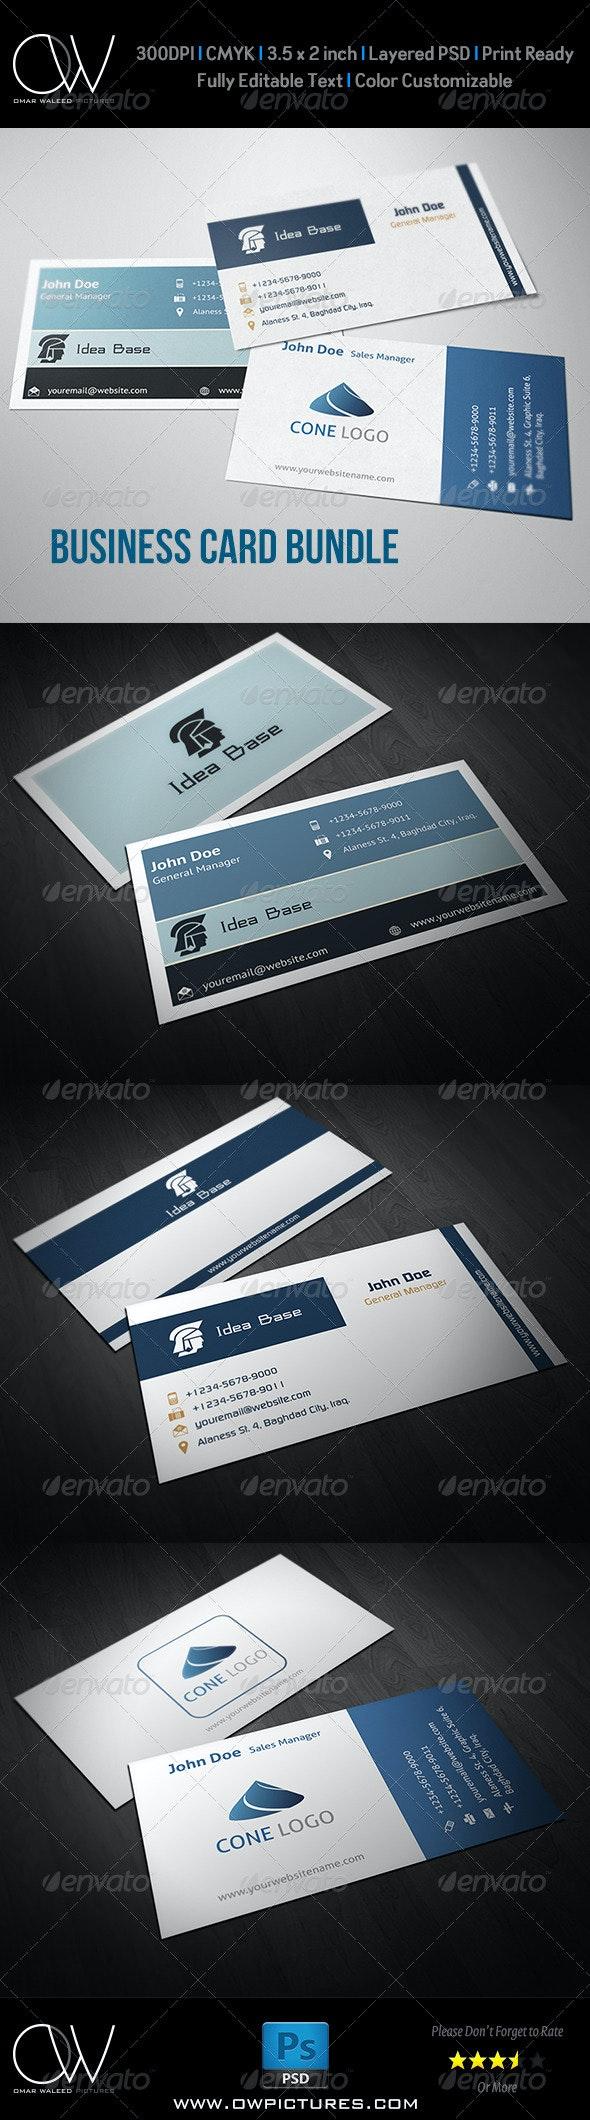 Corporate Business Card Bundle Vol.1 - Corporate Business Cards